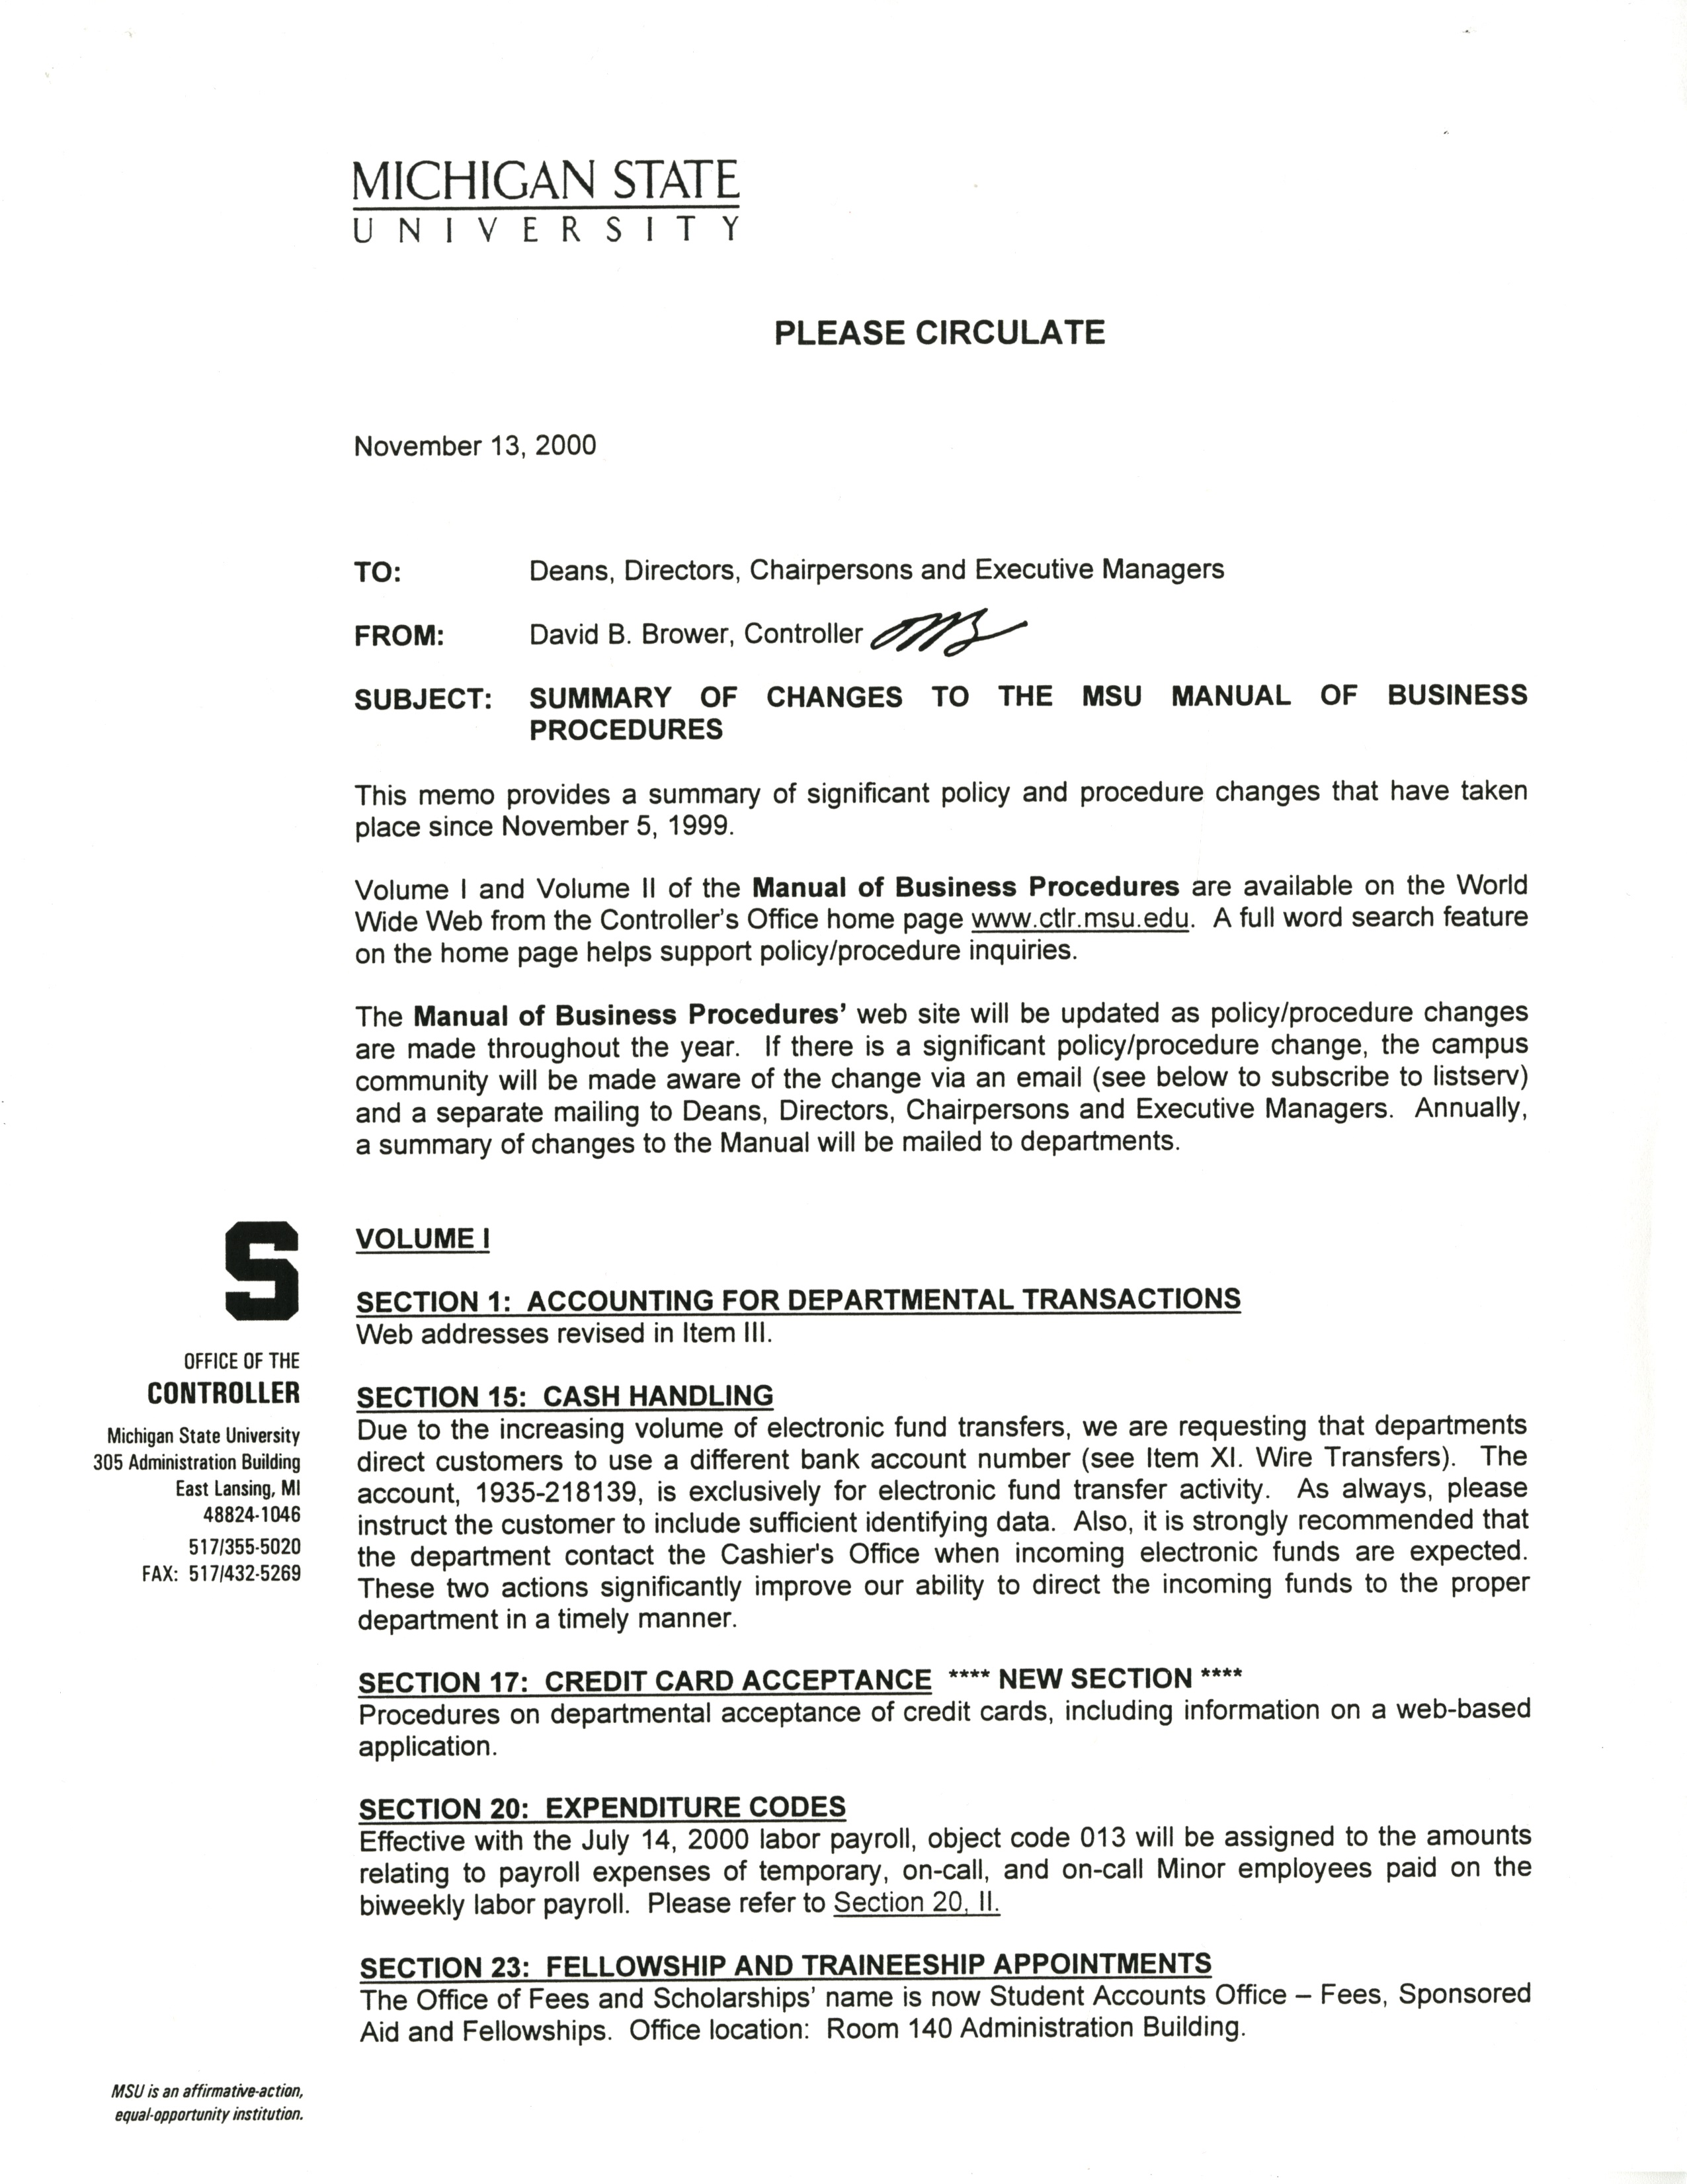 MSU Manual of Business Procedures, 1999-2000